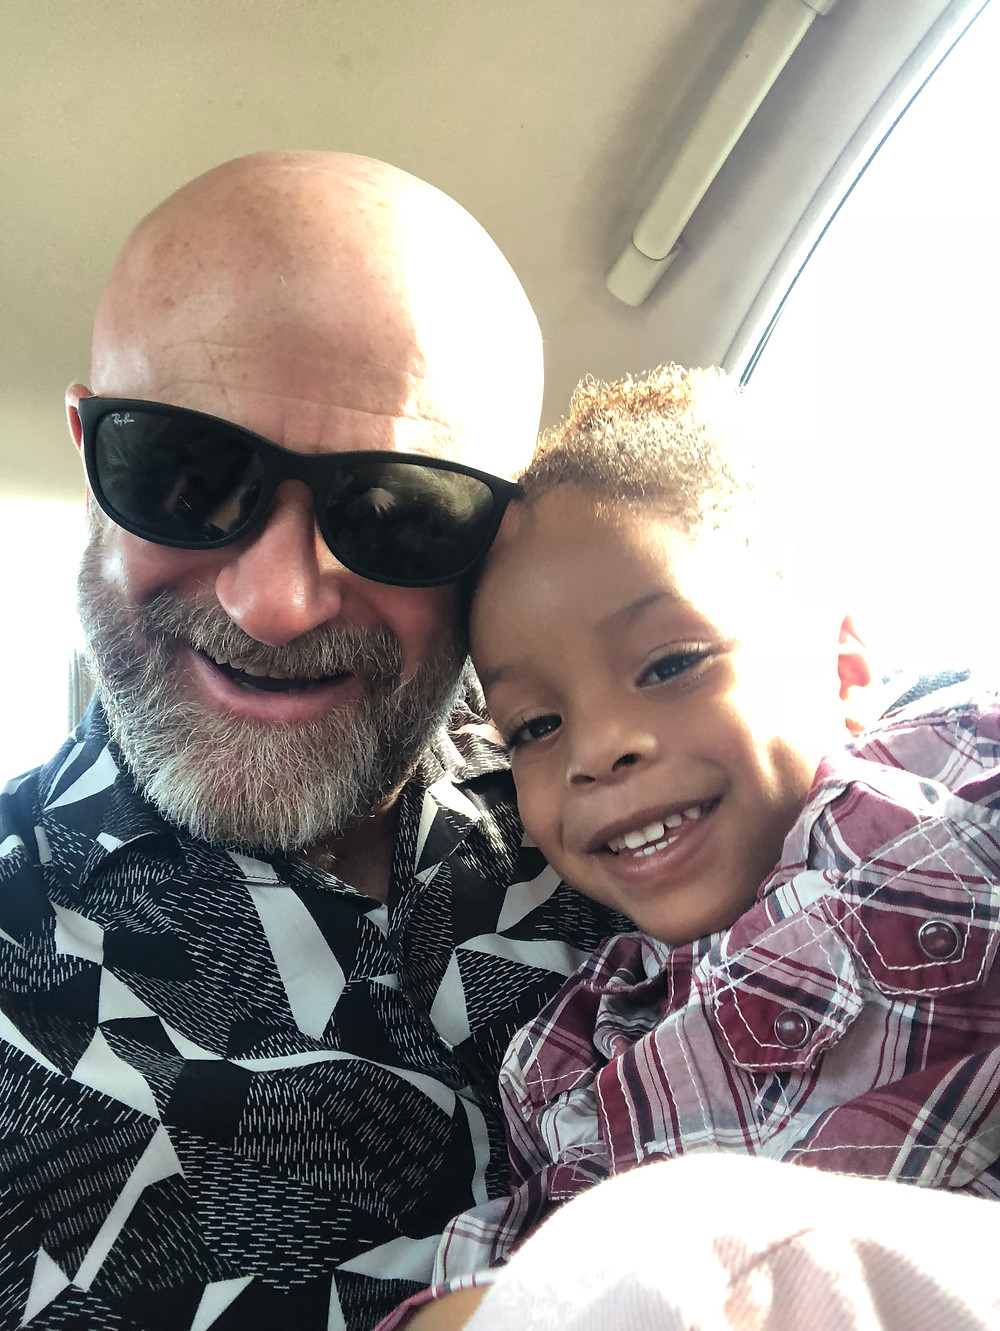 life coach Eddy Smits next to smiling child